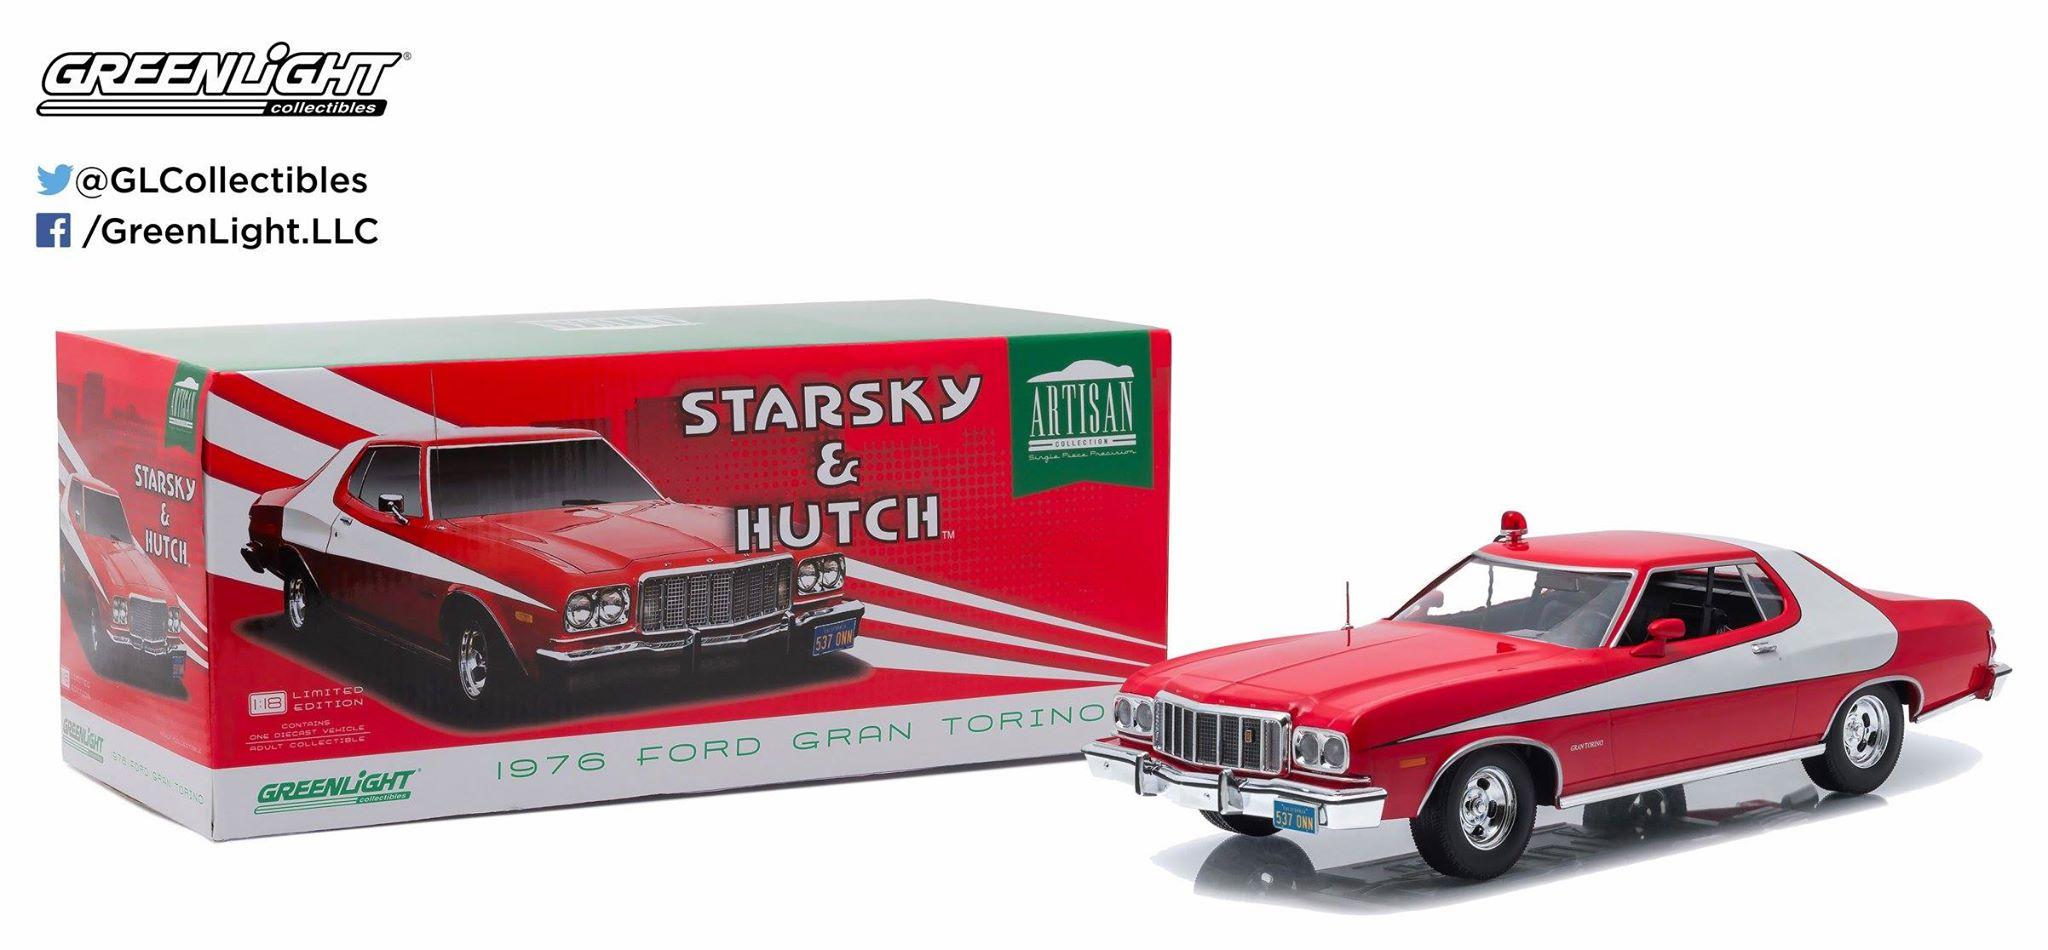 starsky hutch 1976 ford gran torino artisan collection. Black Bedroom Furniture Sets. Home Design Ideas